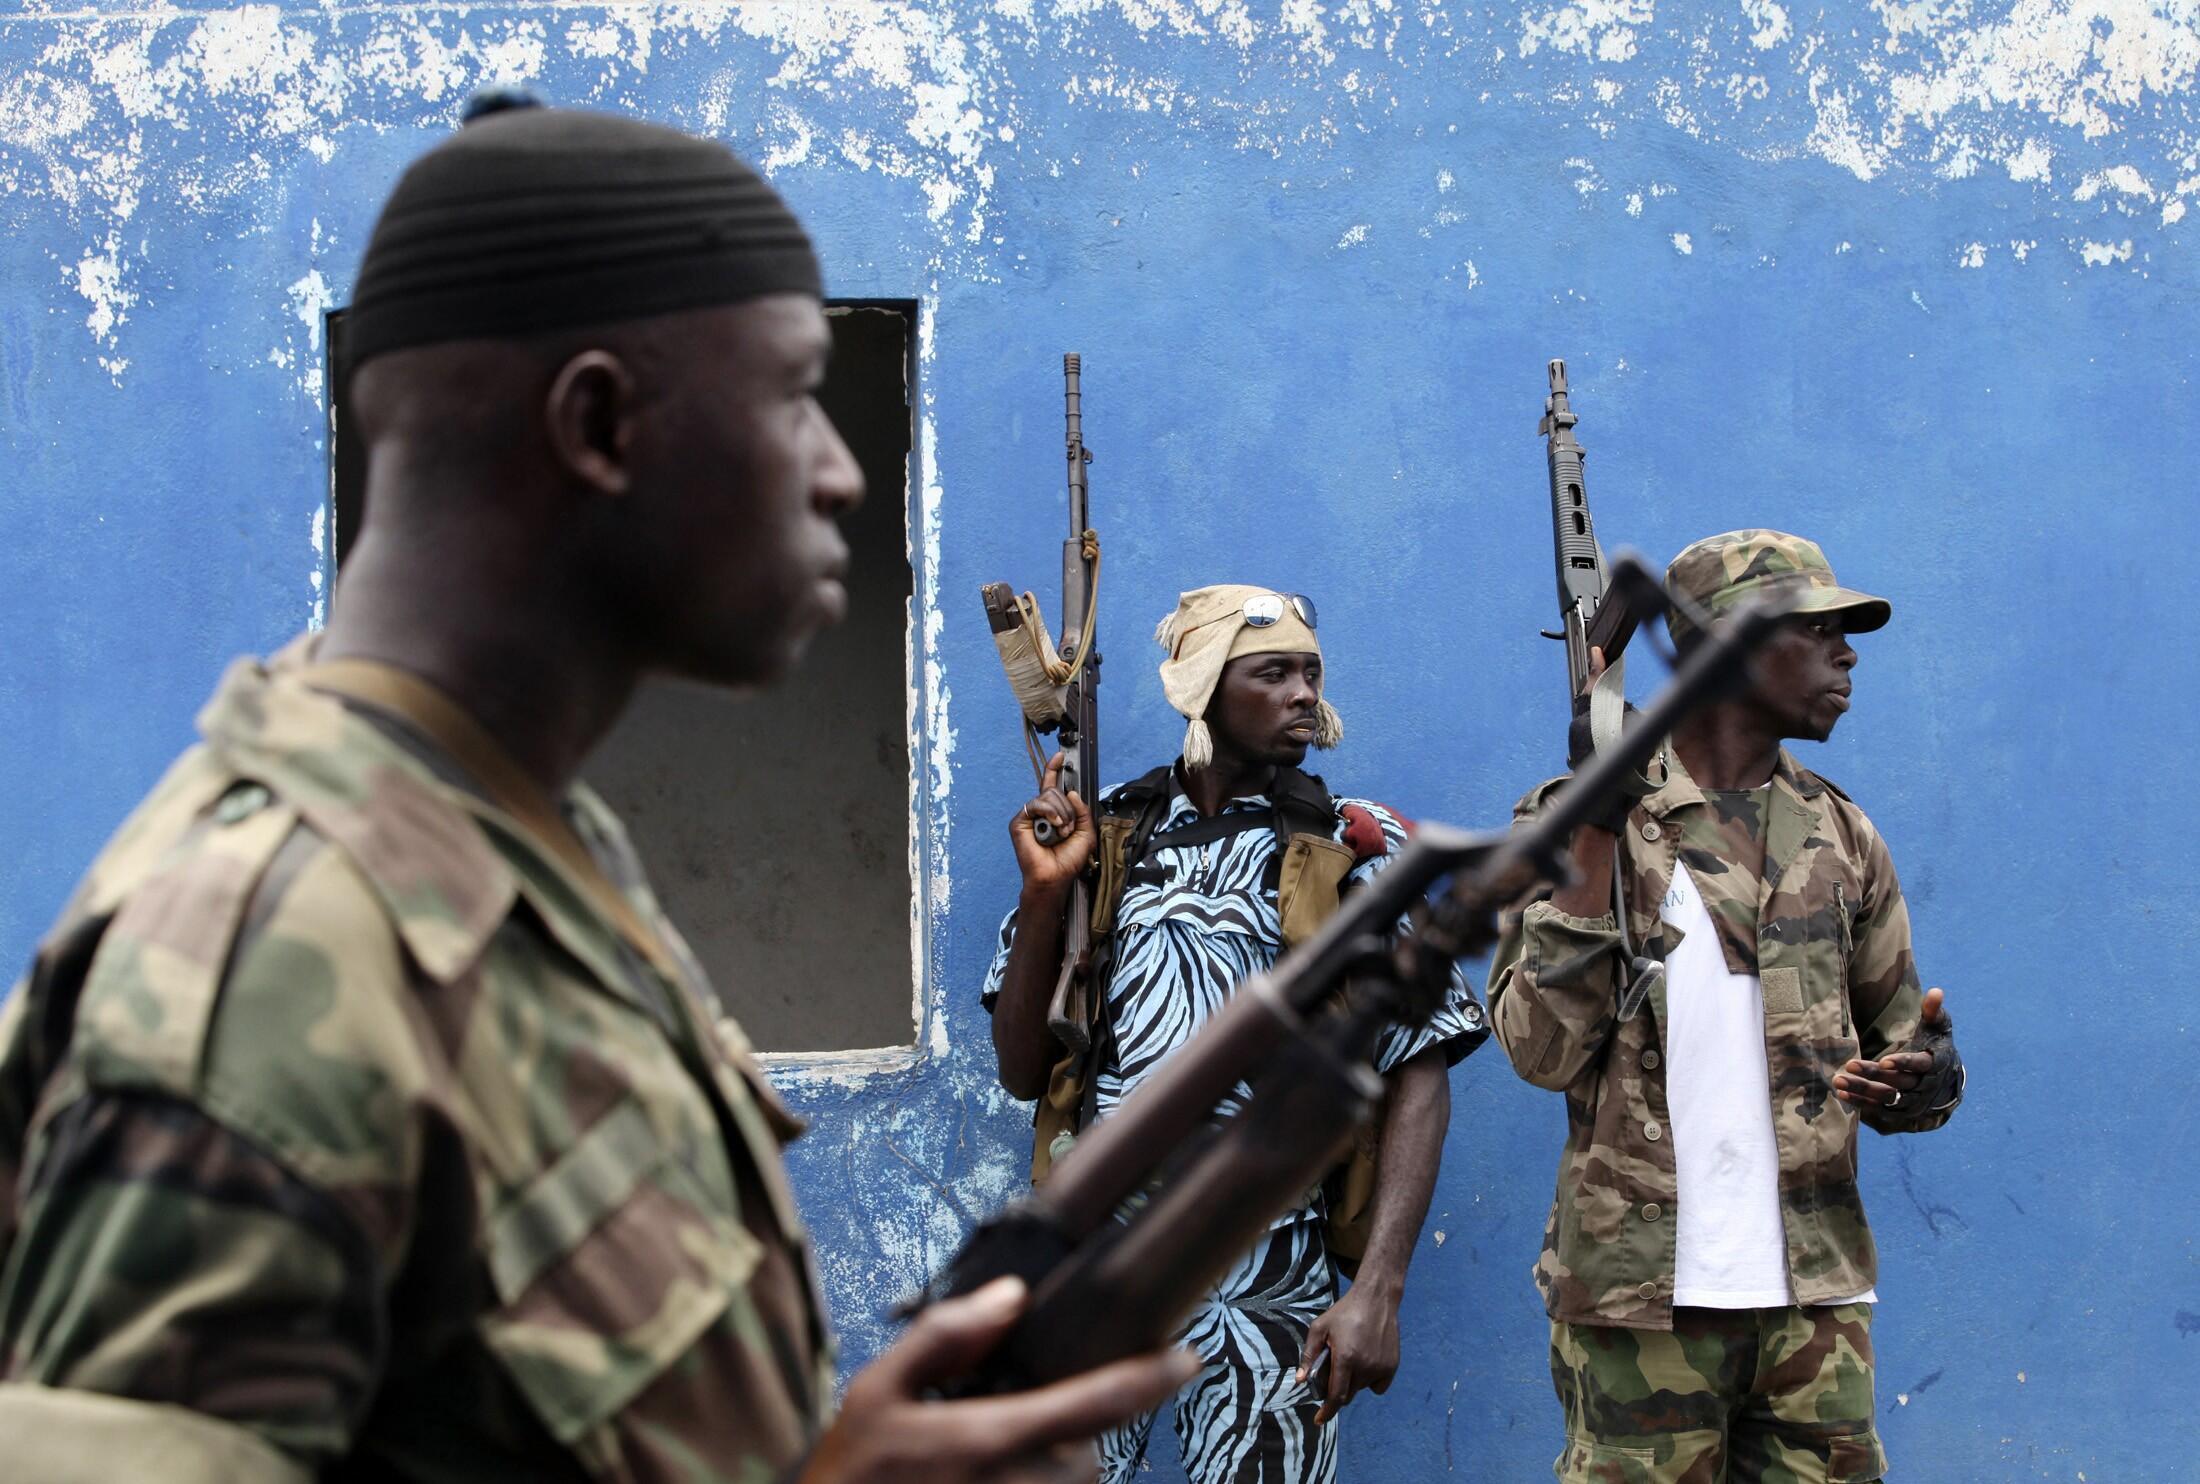 Dakarun kasar Cote-D'Ivoire